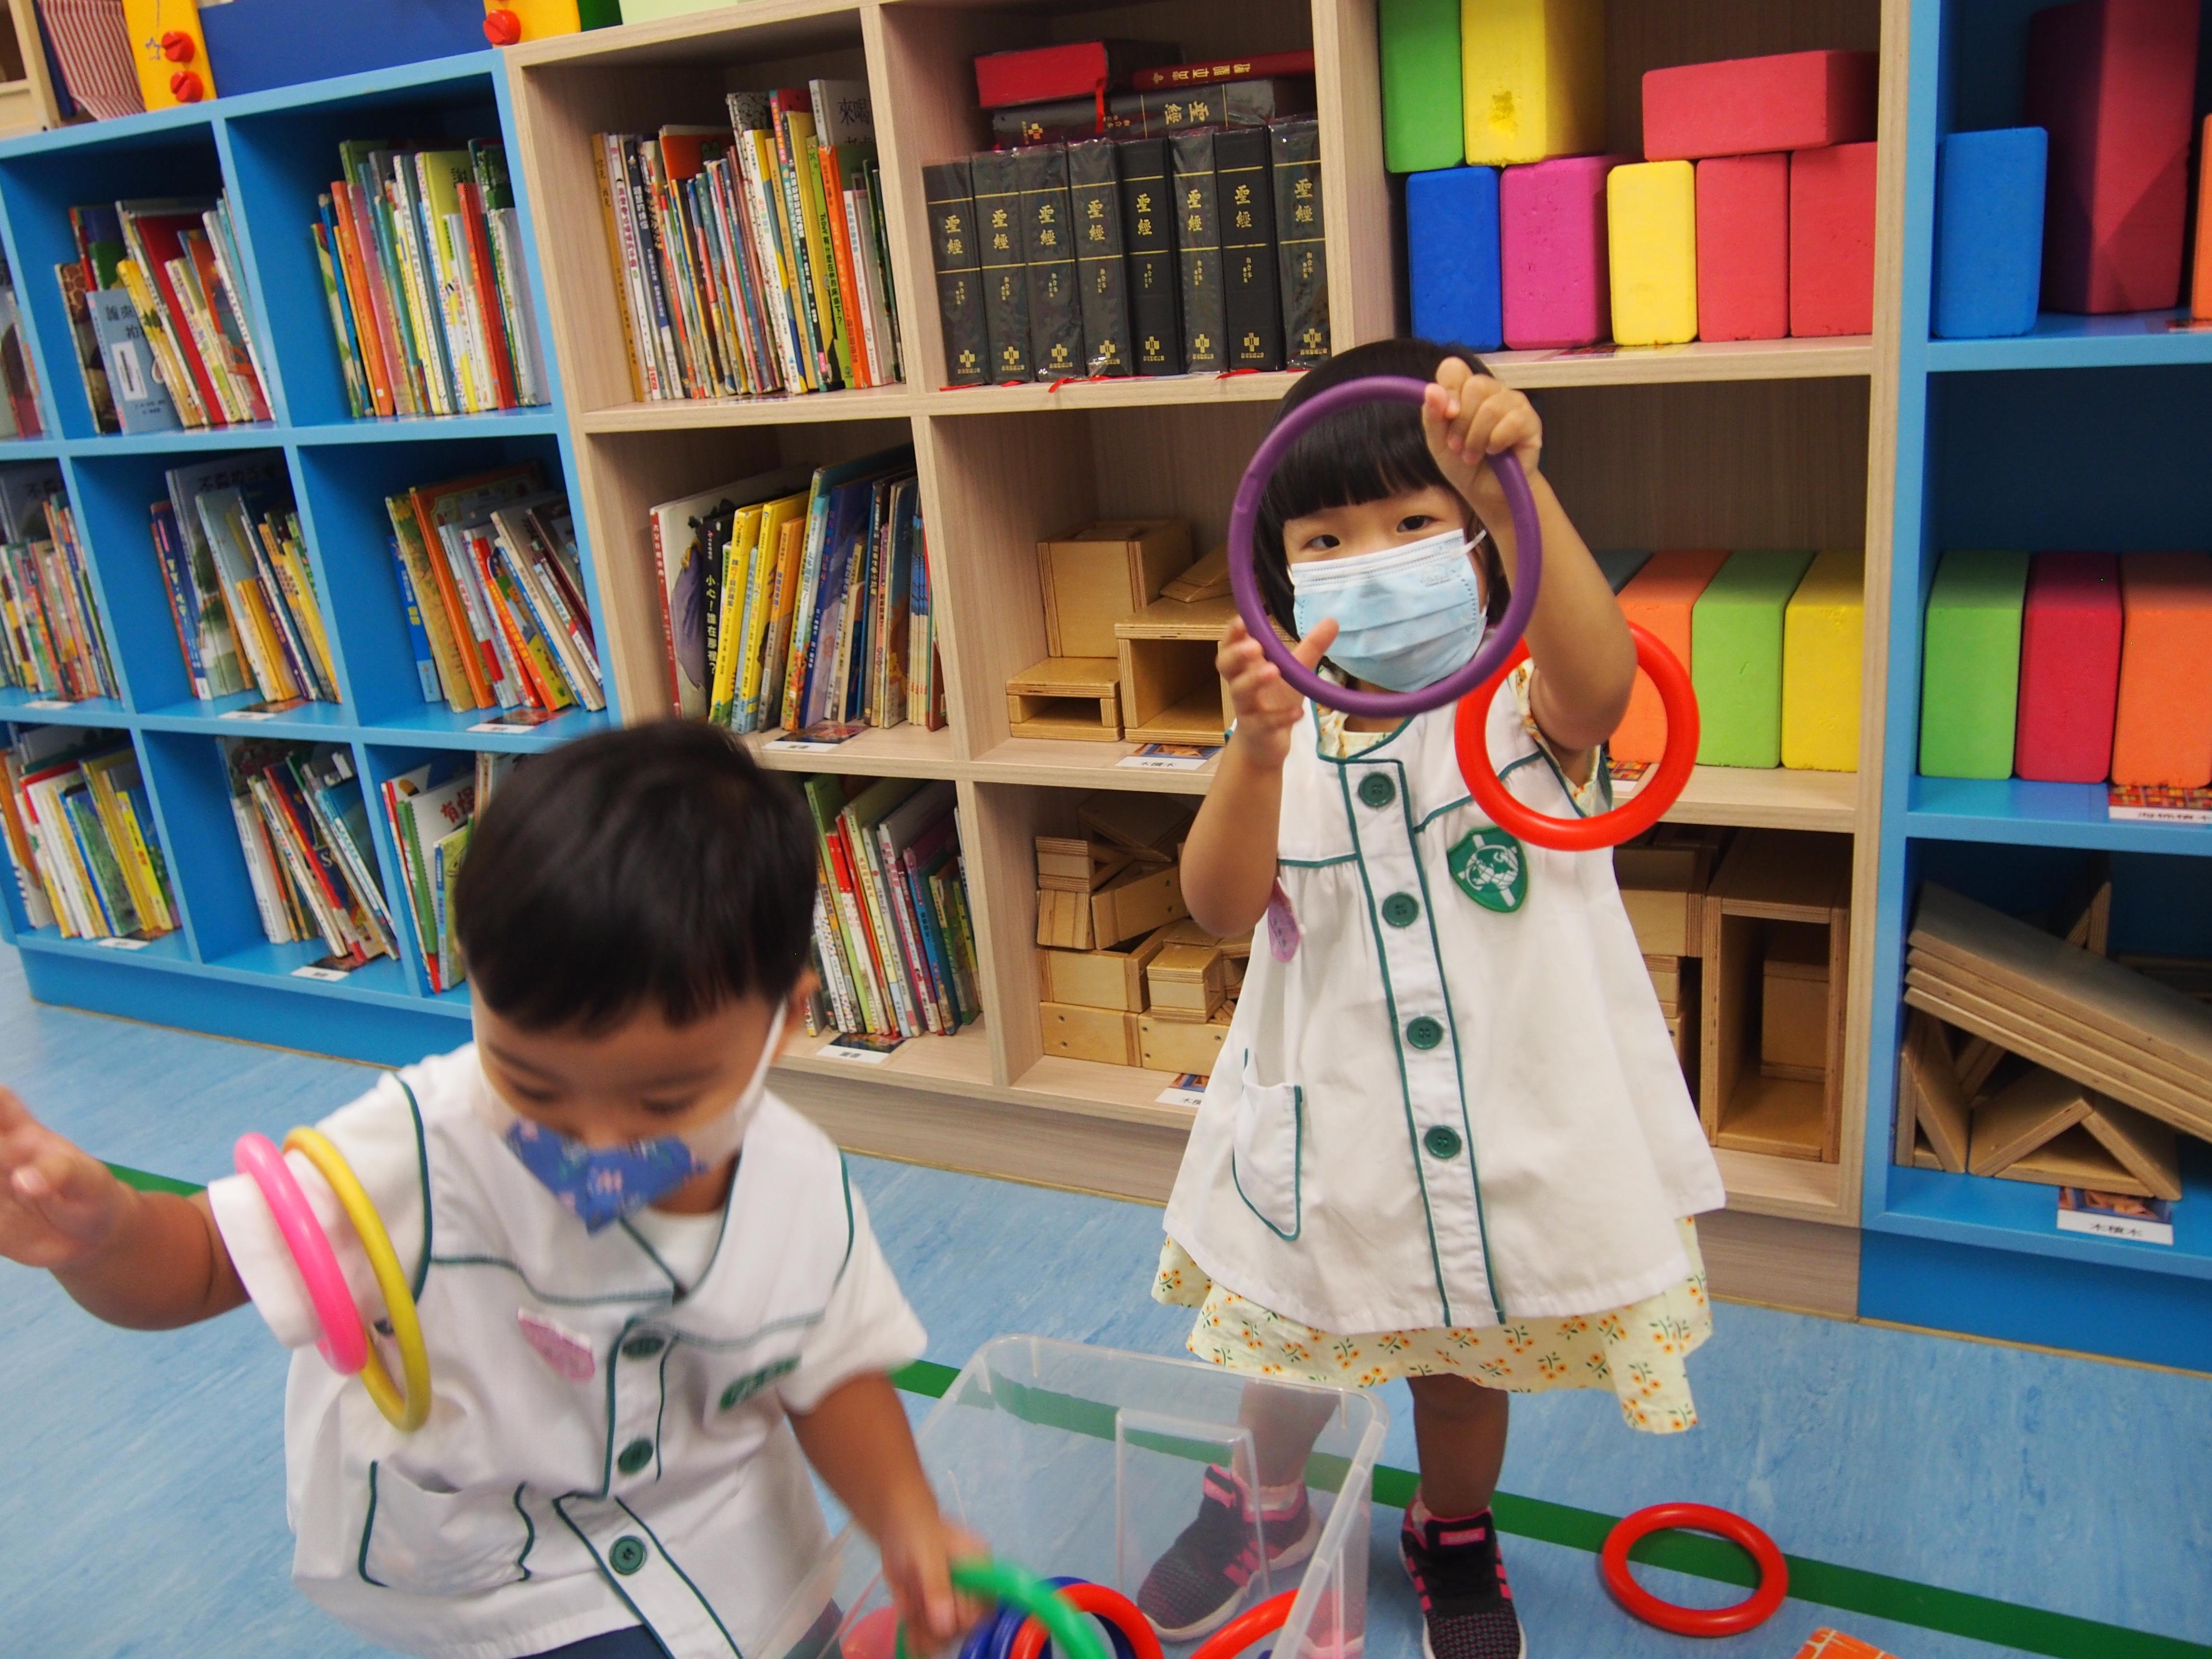 http://npmc.edu.hk/sites/default/files/p1010257.jpg